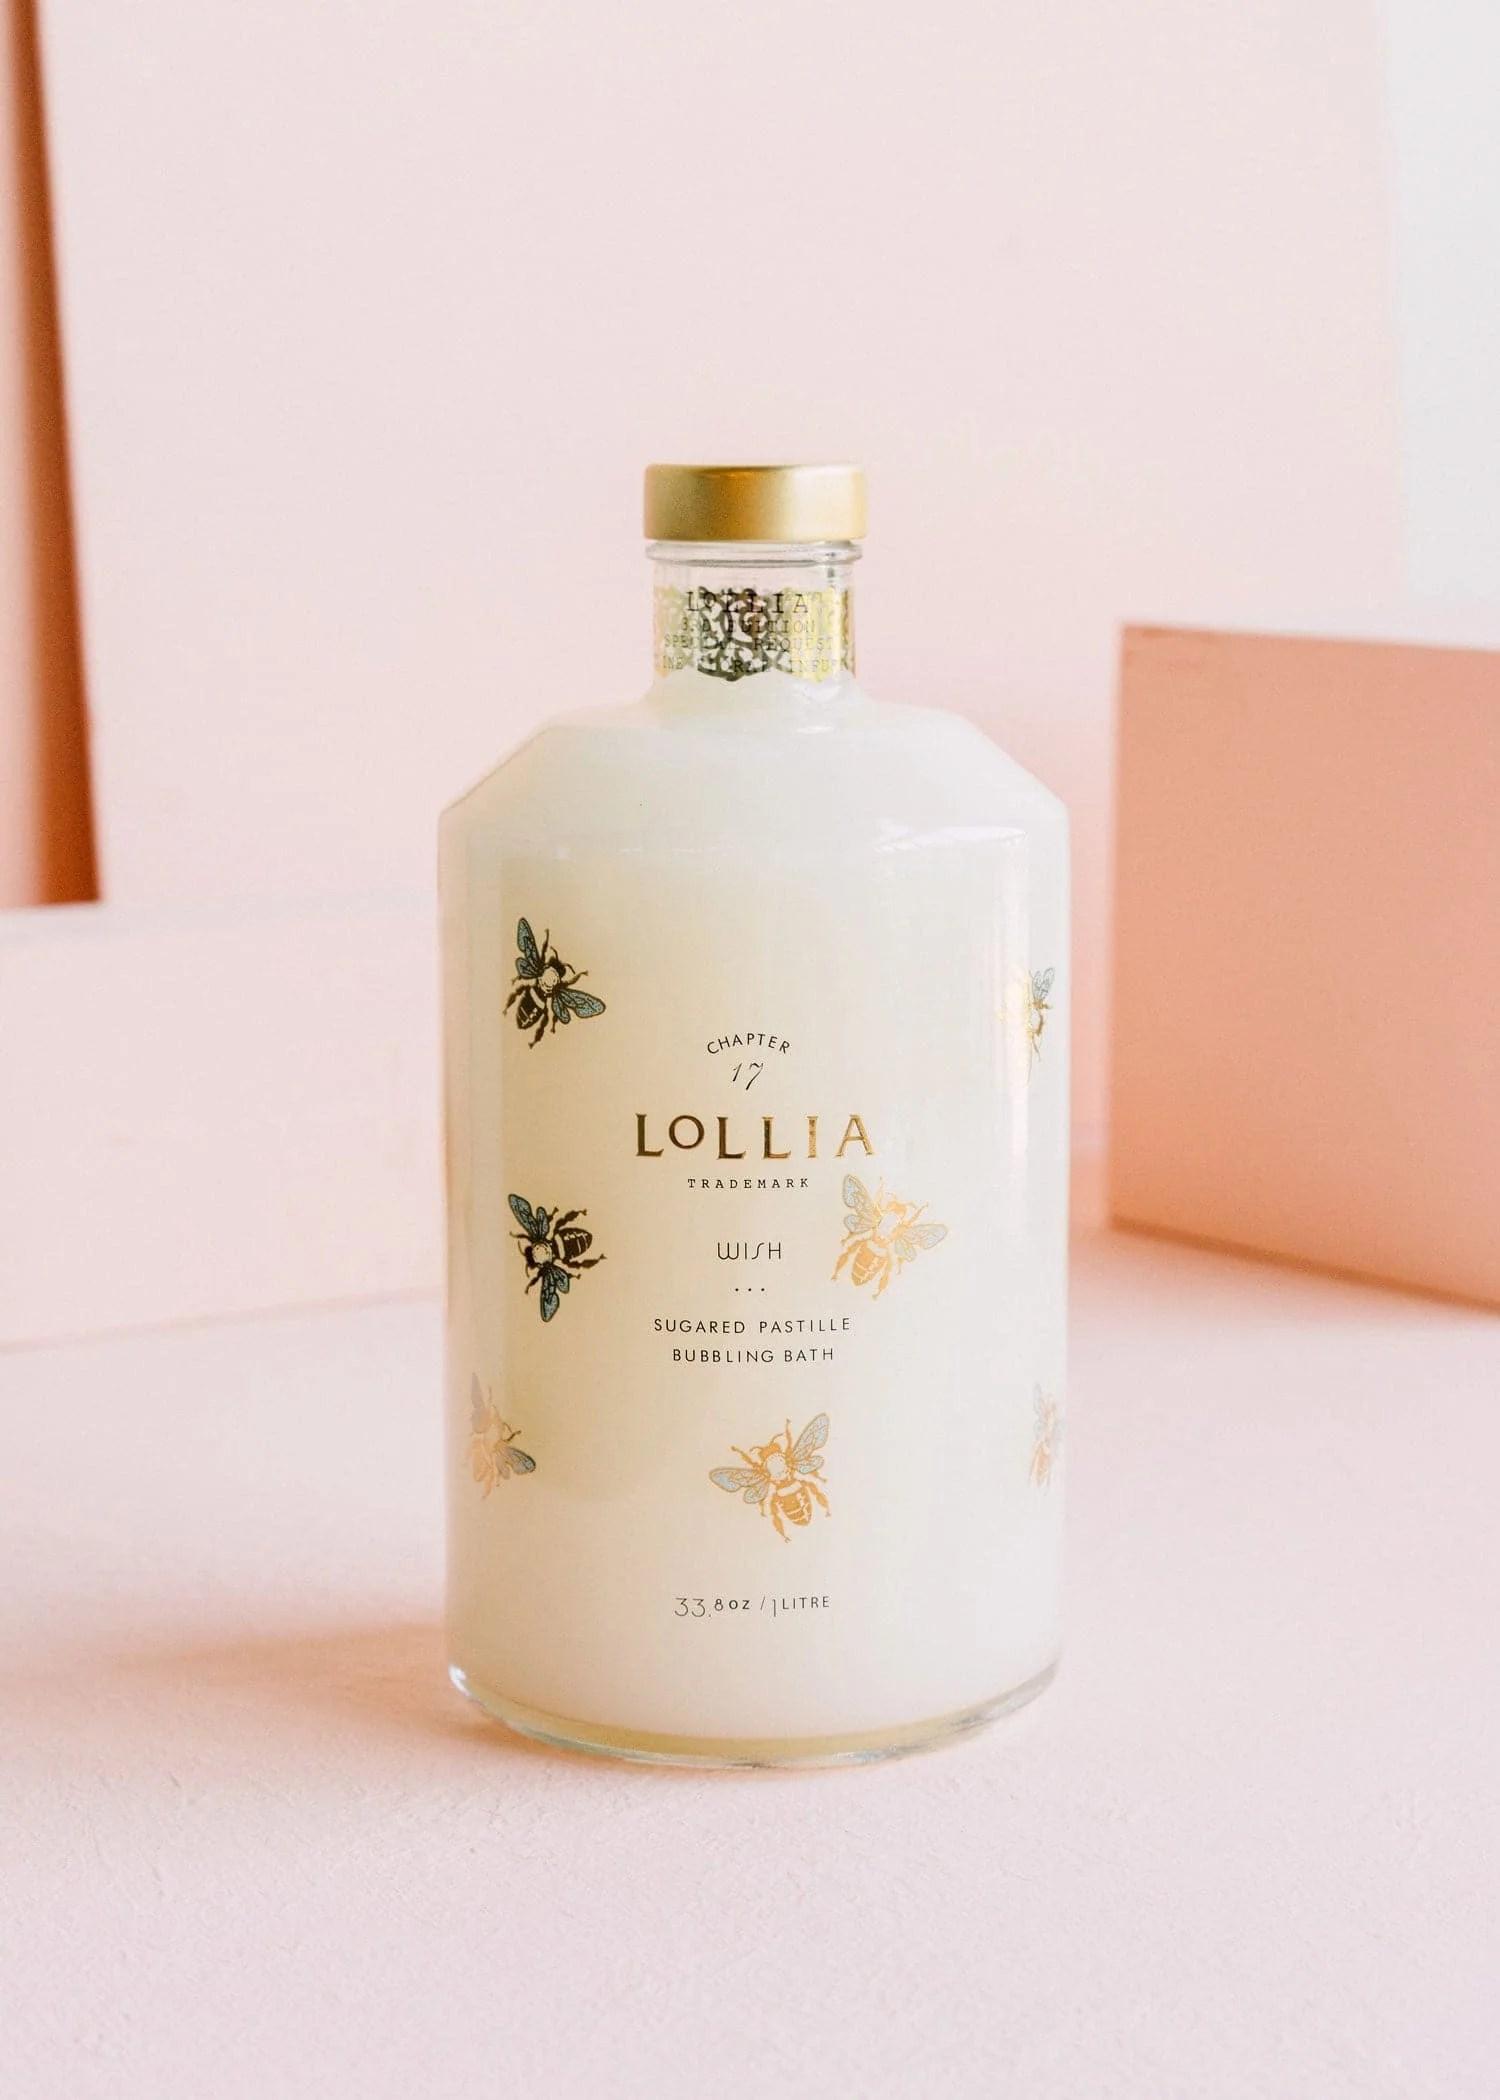 Lollia Wish Perfumed Luxury Bubble Bath Margot Elena